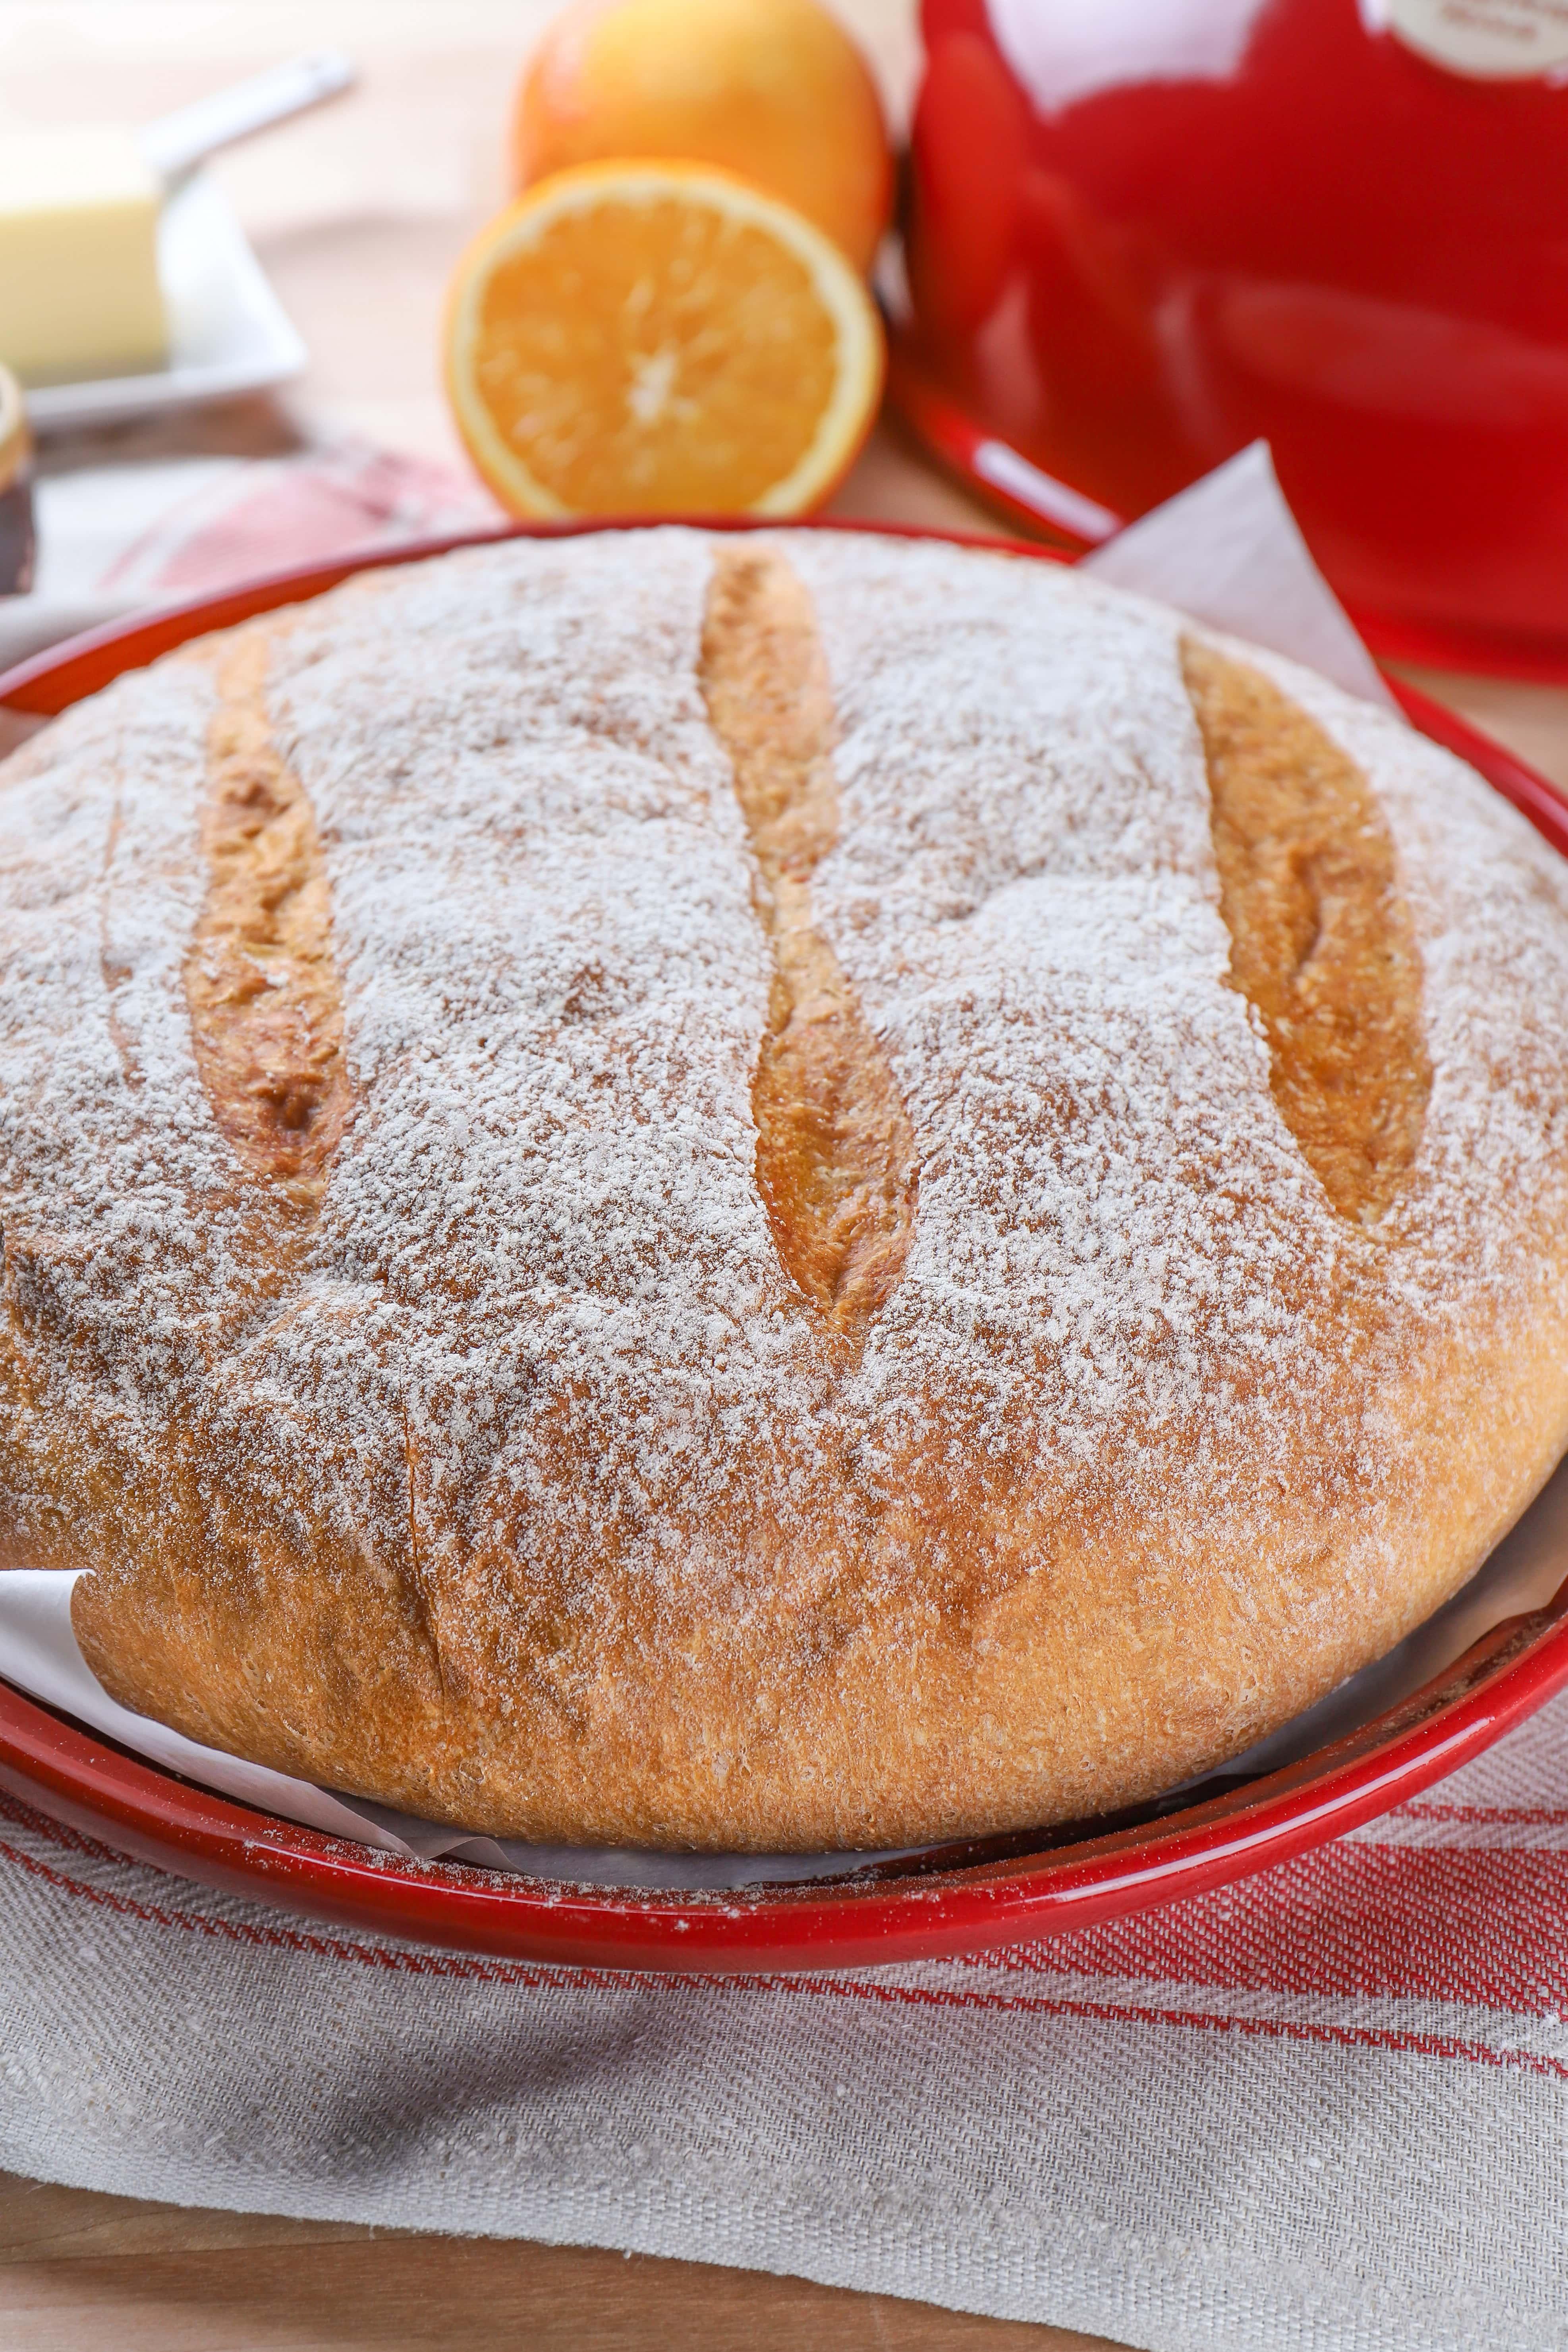 Loaf of artisan orange cardamom bread